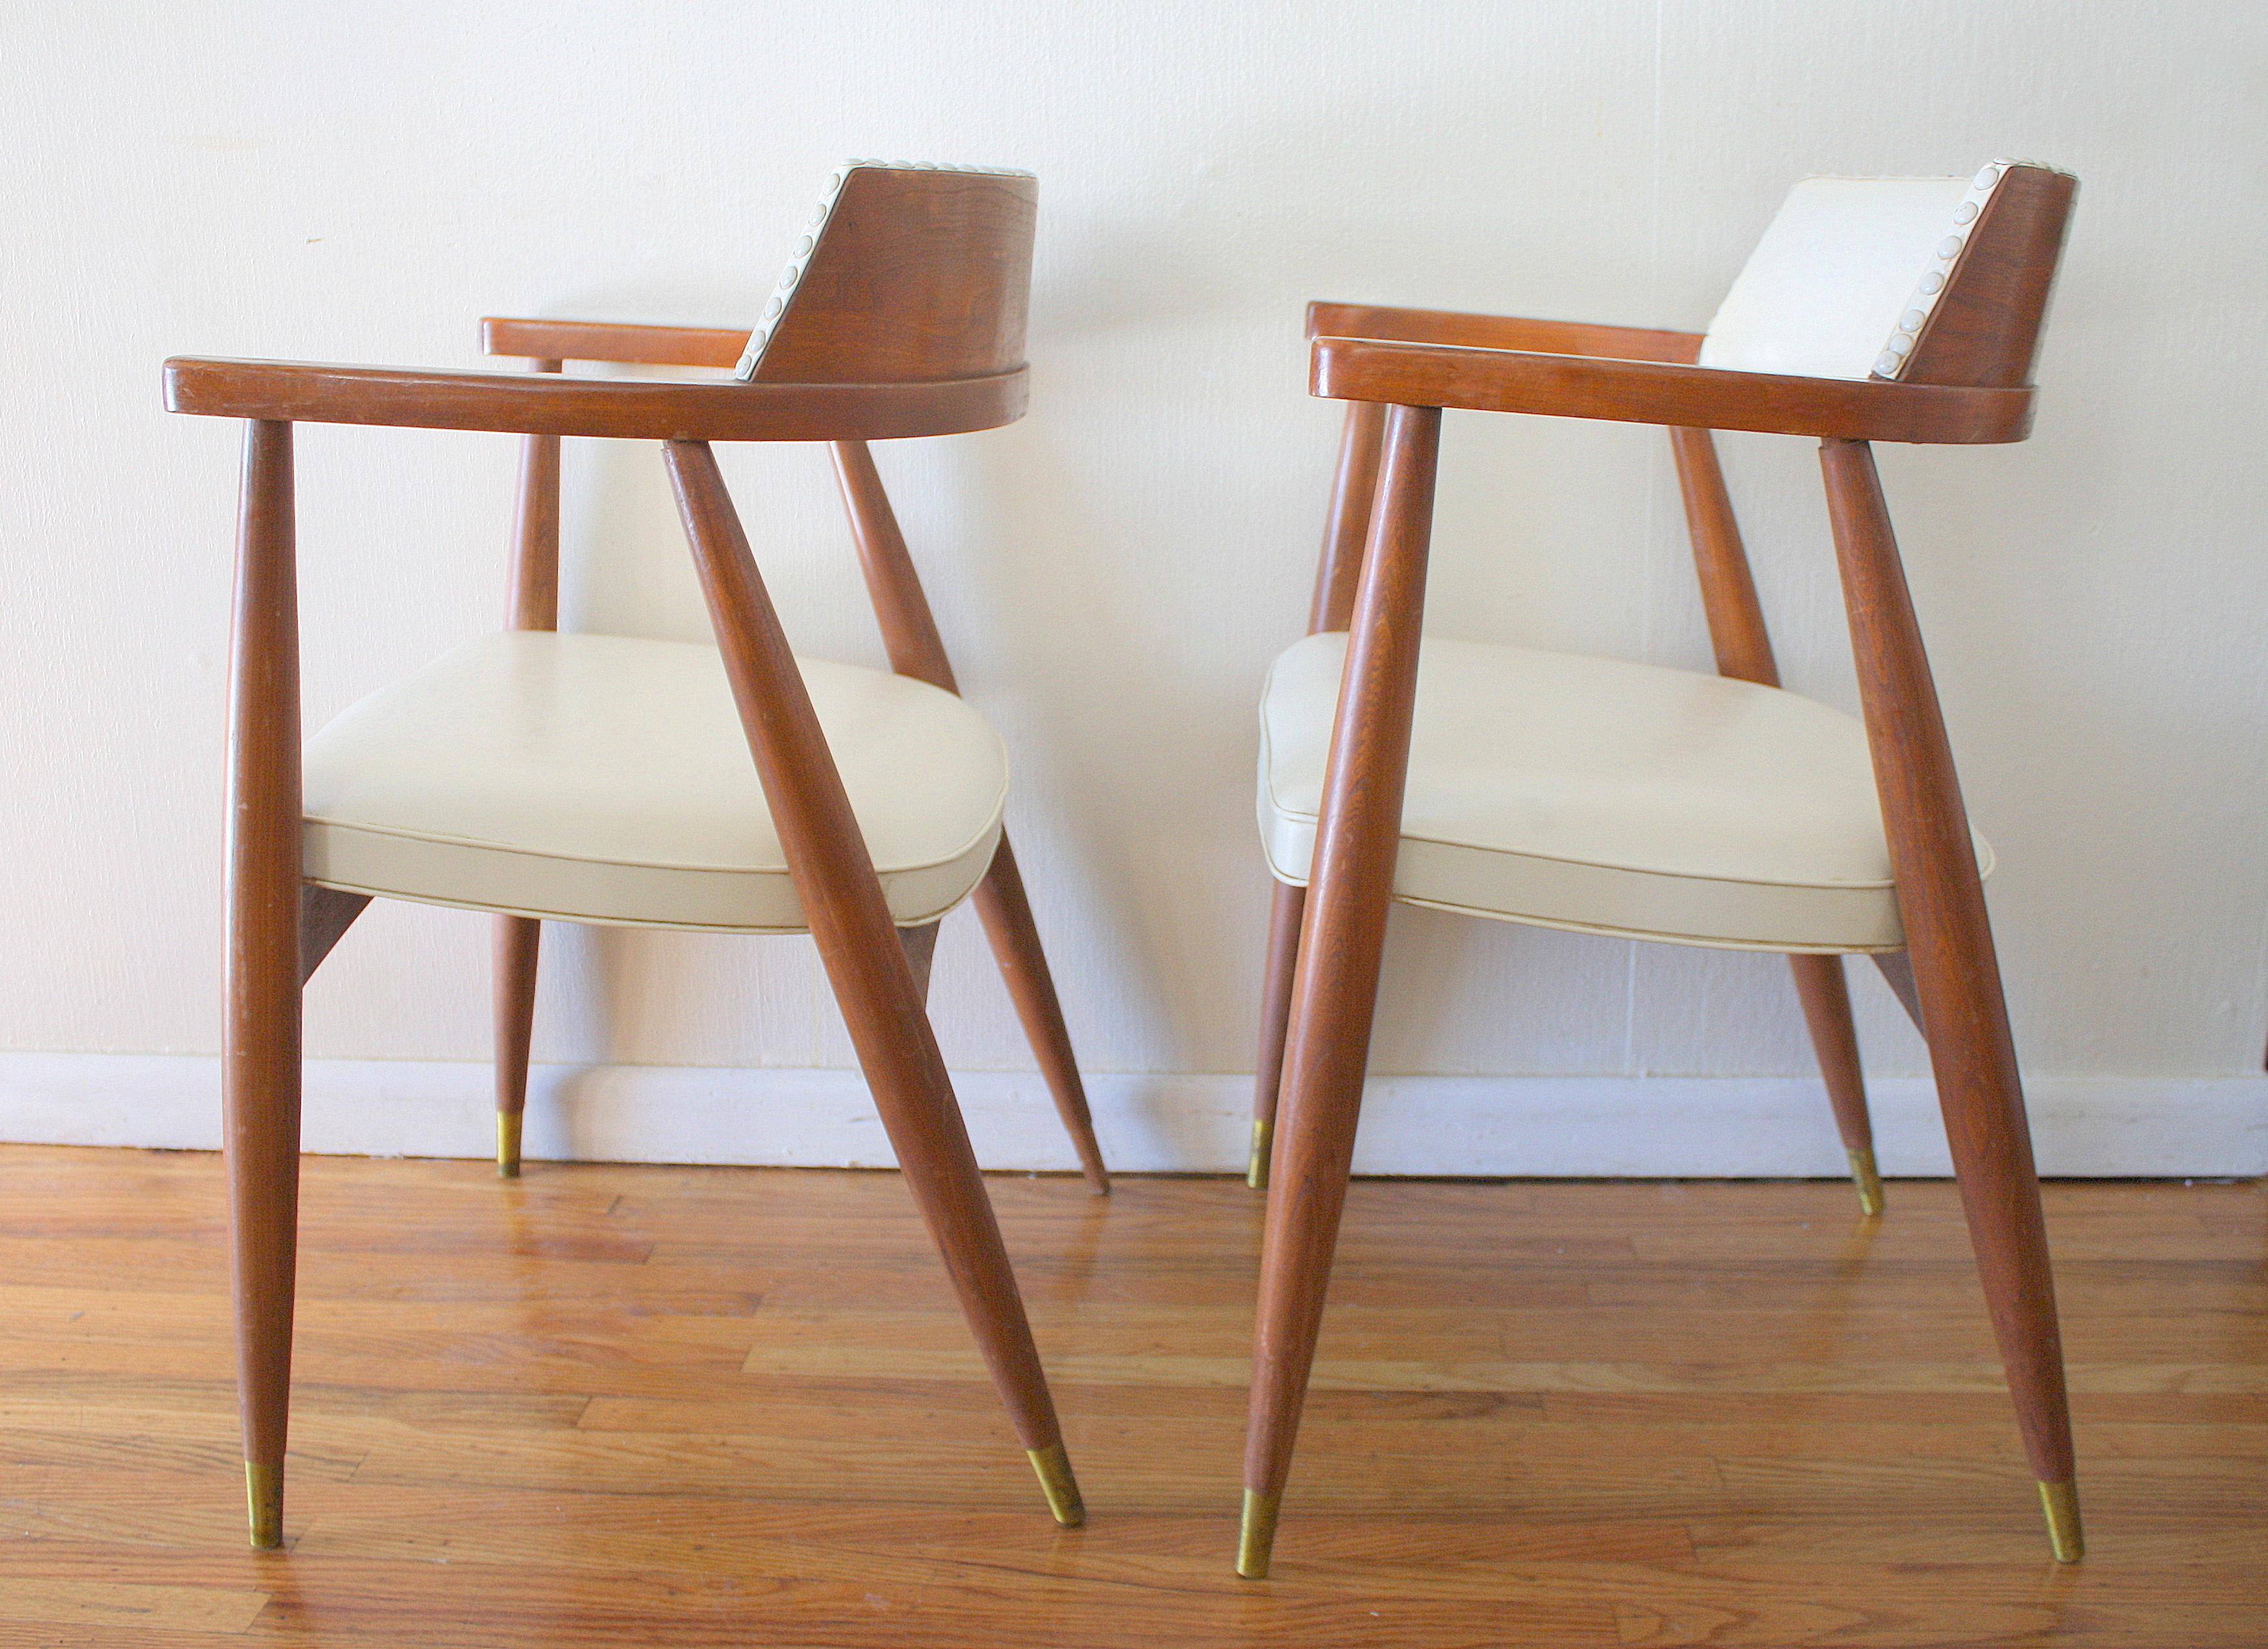 mcm white barrel back chairs 3 Picked Vintage : mcm white barrel back chairs 31 from pickedvintage.com size 3482 x 2531 jpeg 6128kB